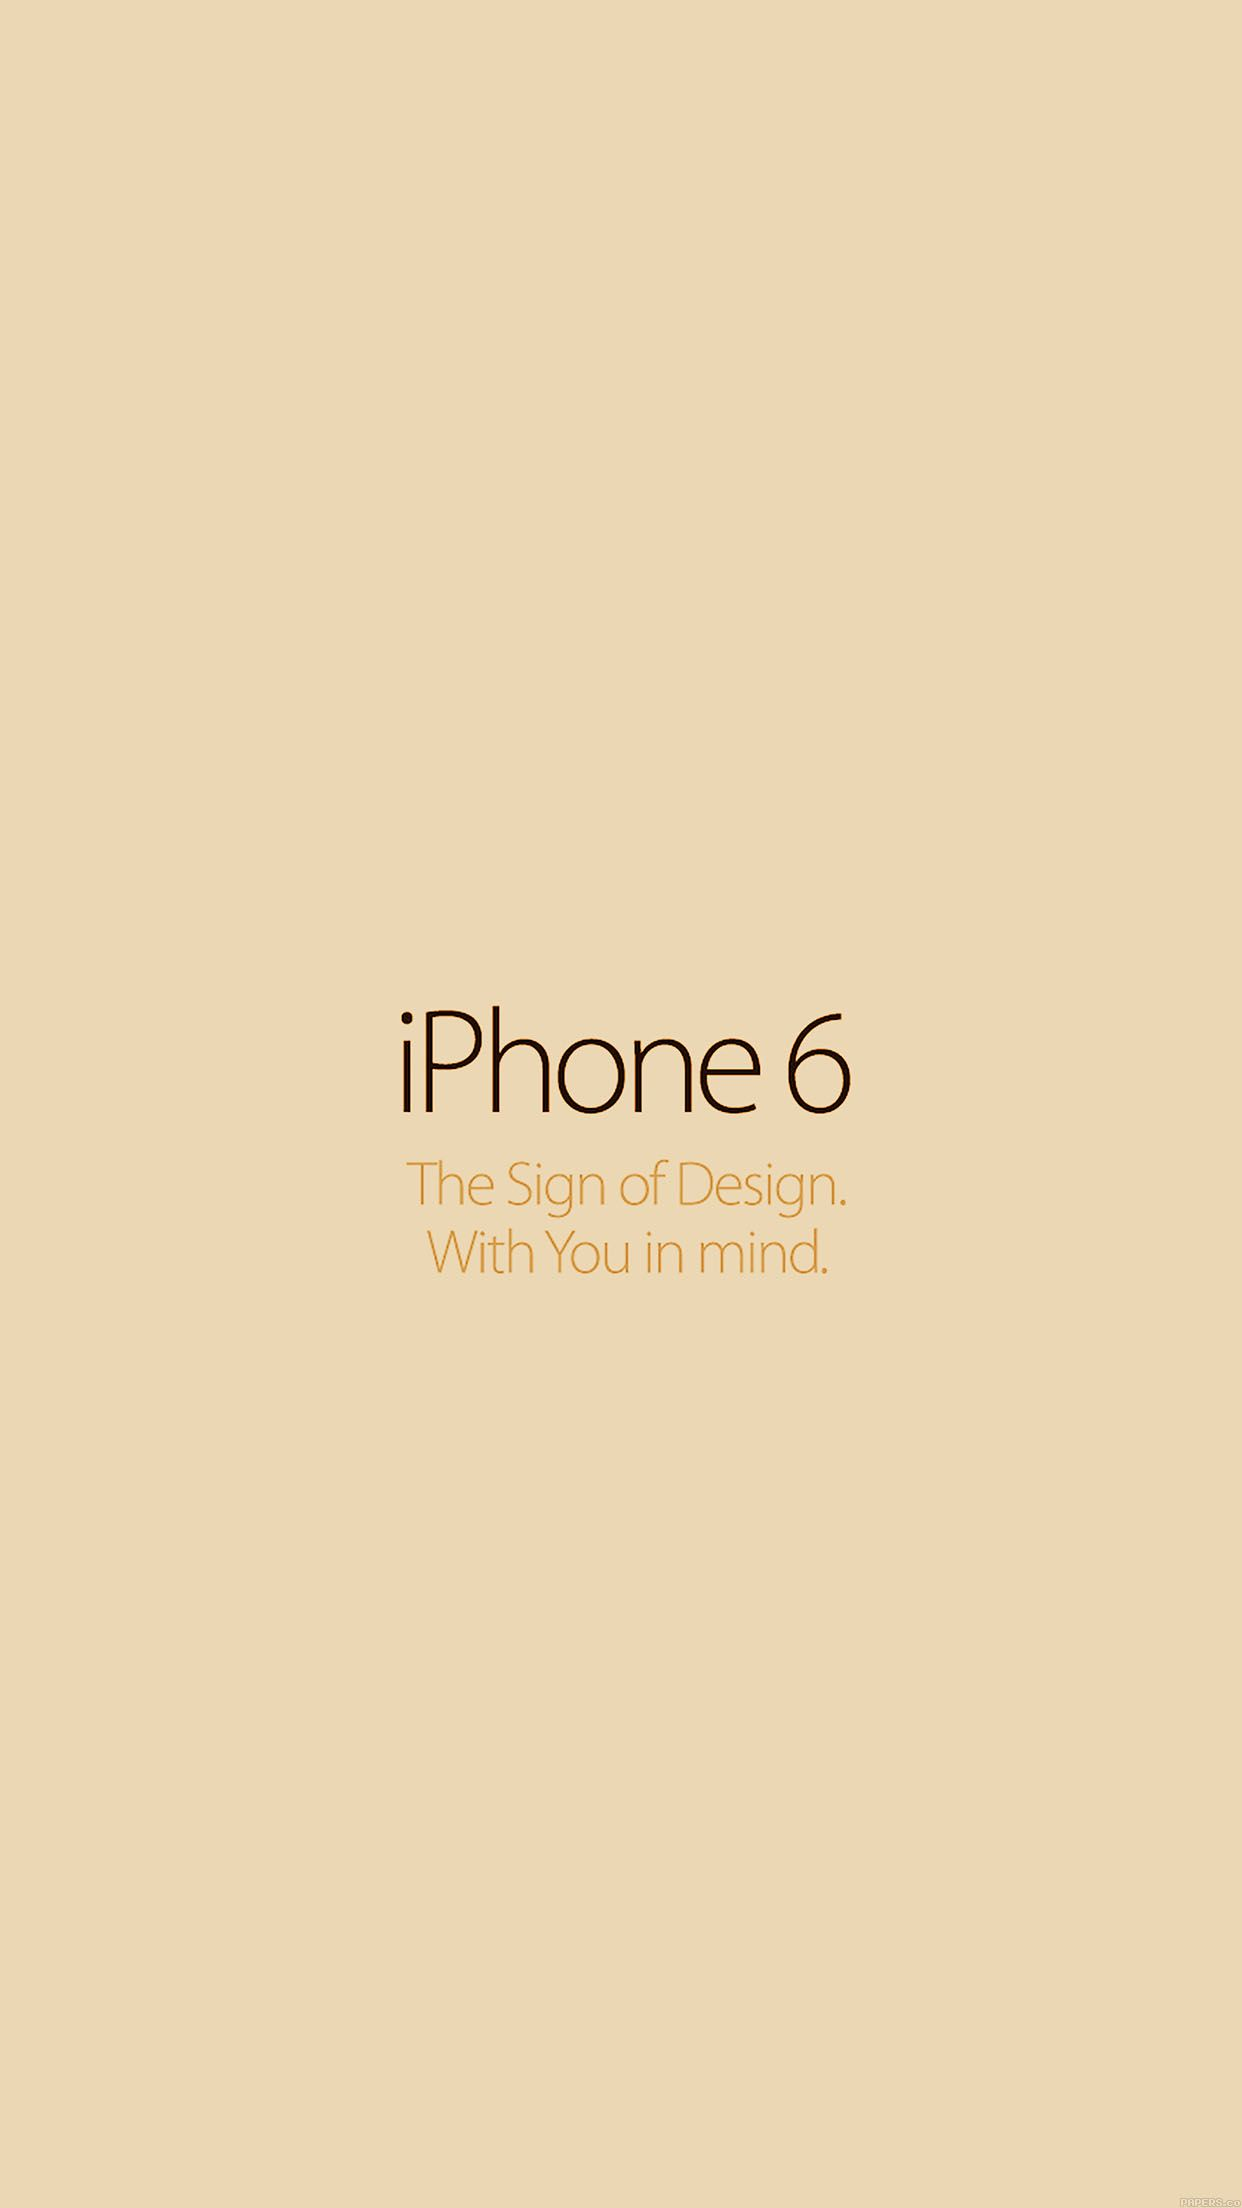 nice wallpaper-iphone6-gold-logo-apple-iphone6-plus-wallpaper